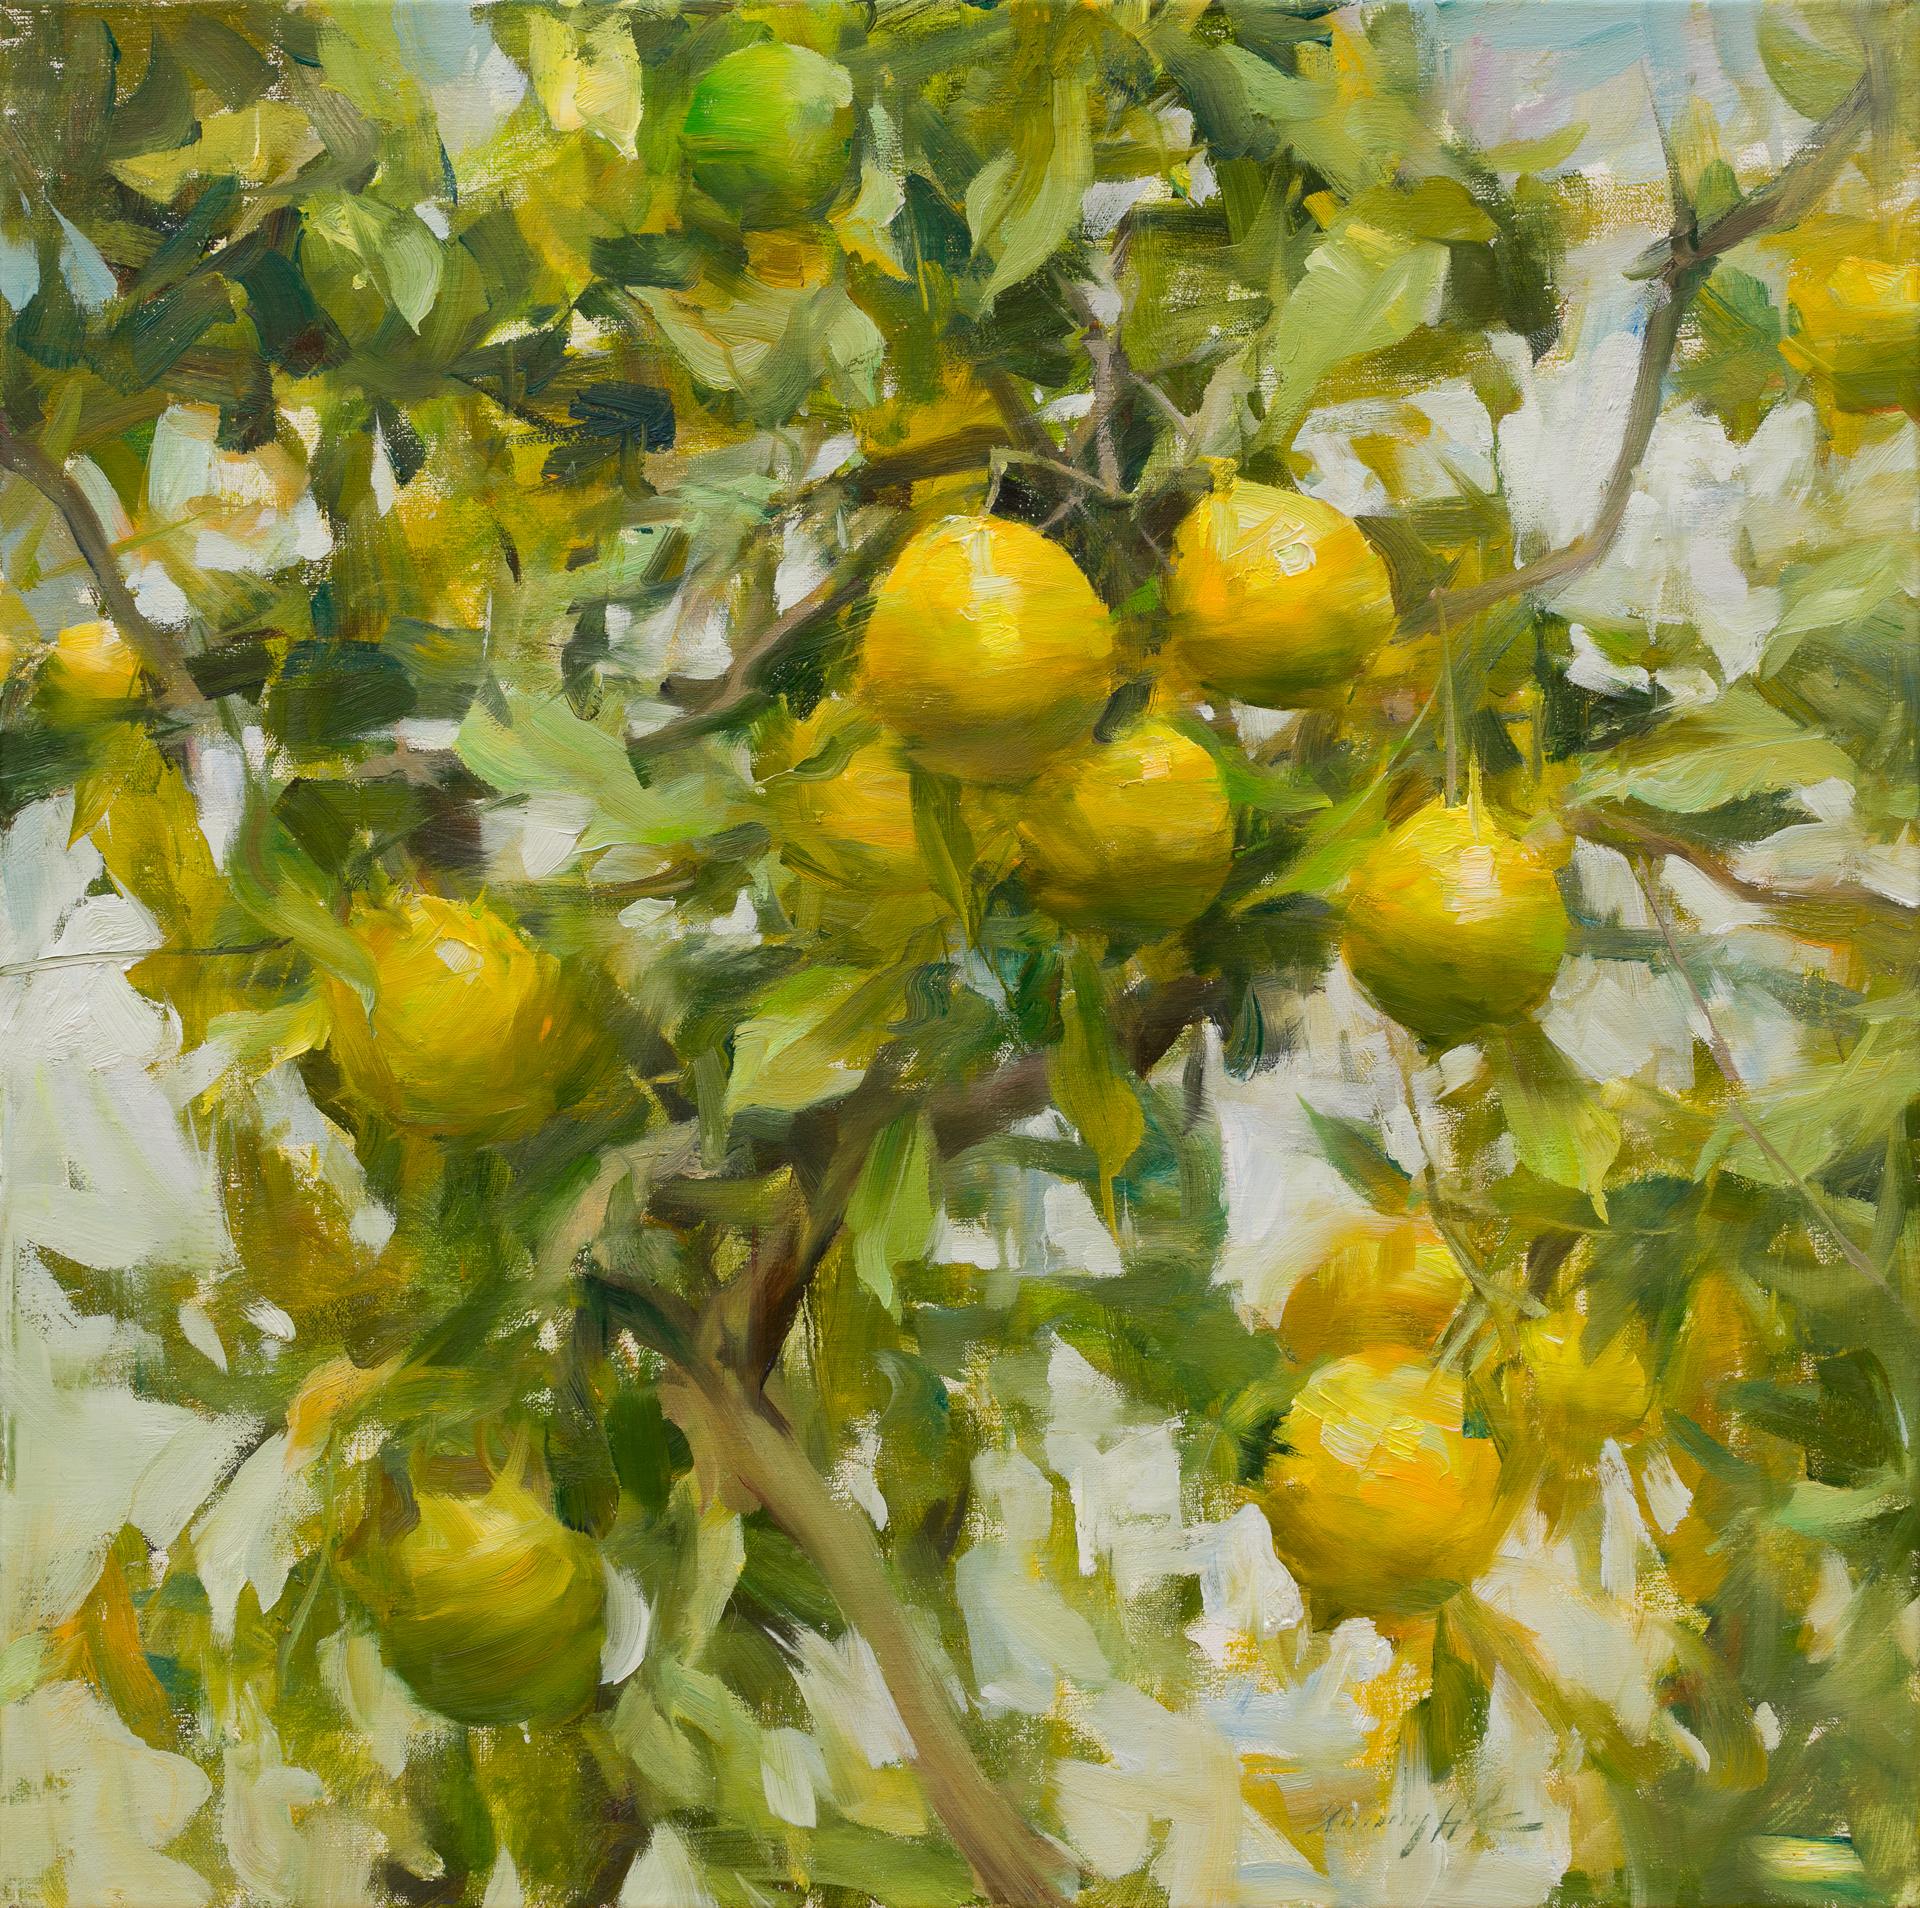 California Lemons by Quang Ho